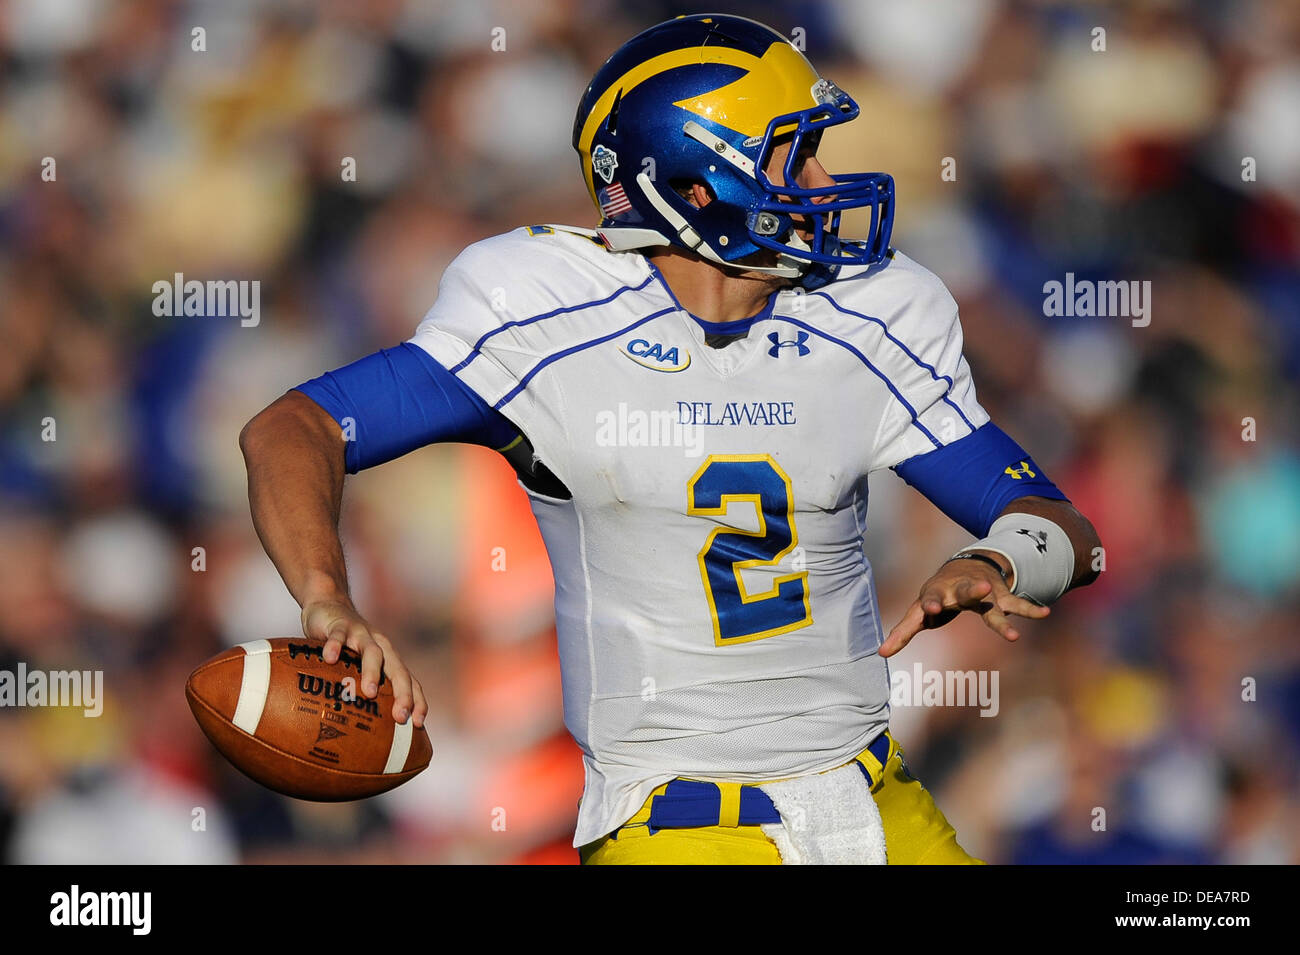 new concept 09b5e 92b08 SEP 14, 2013 :Delaware Fightin Blue Hens quarterback Trent ...